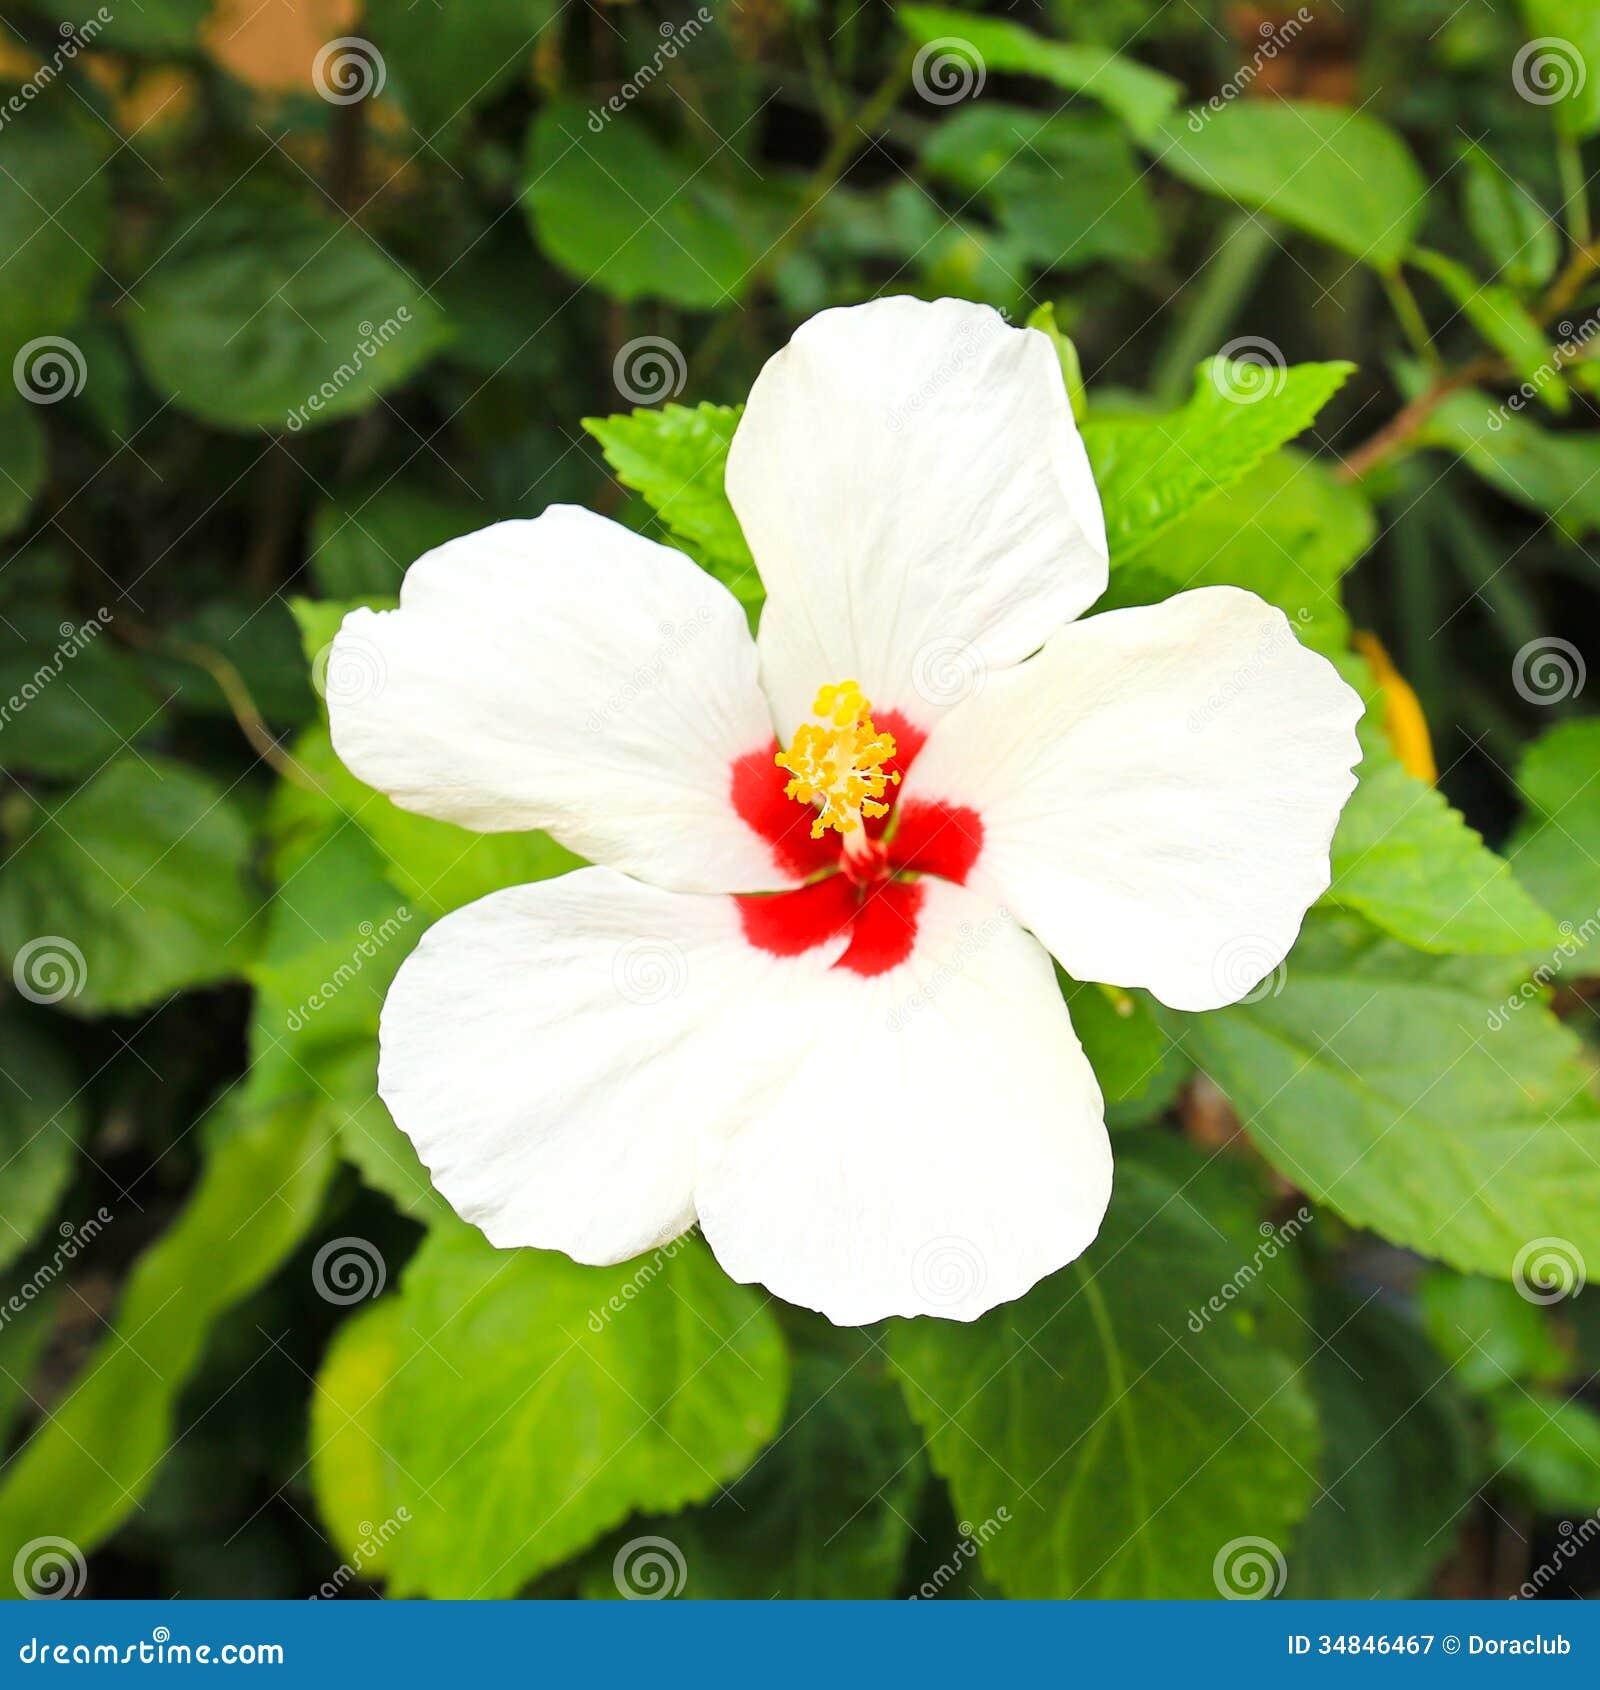 White Hibiscus Flower Stock Image Image Of Blossom Decorative